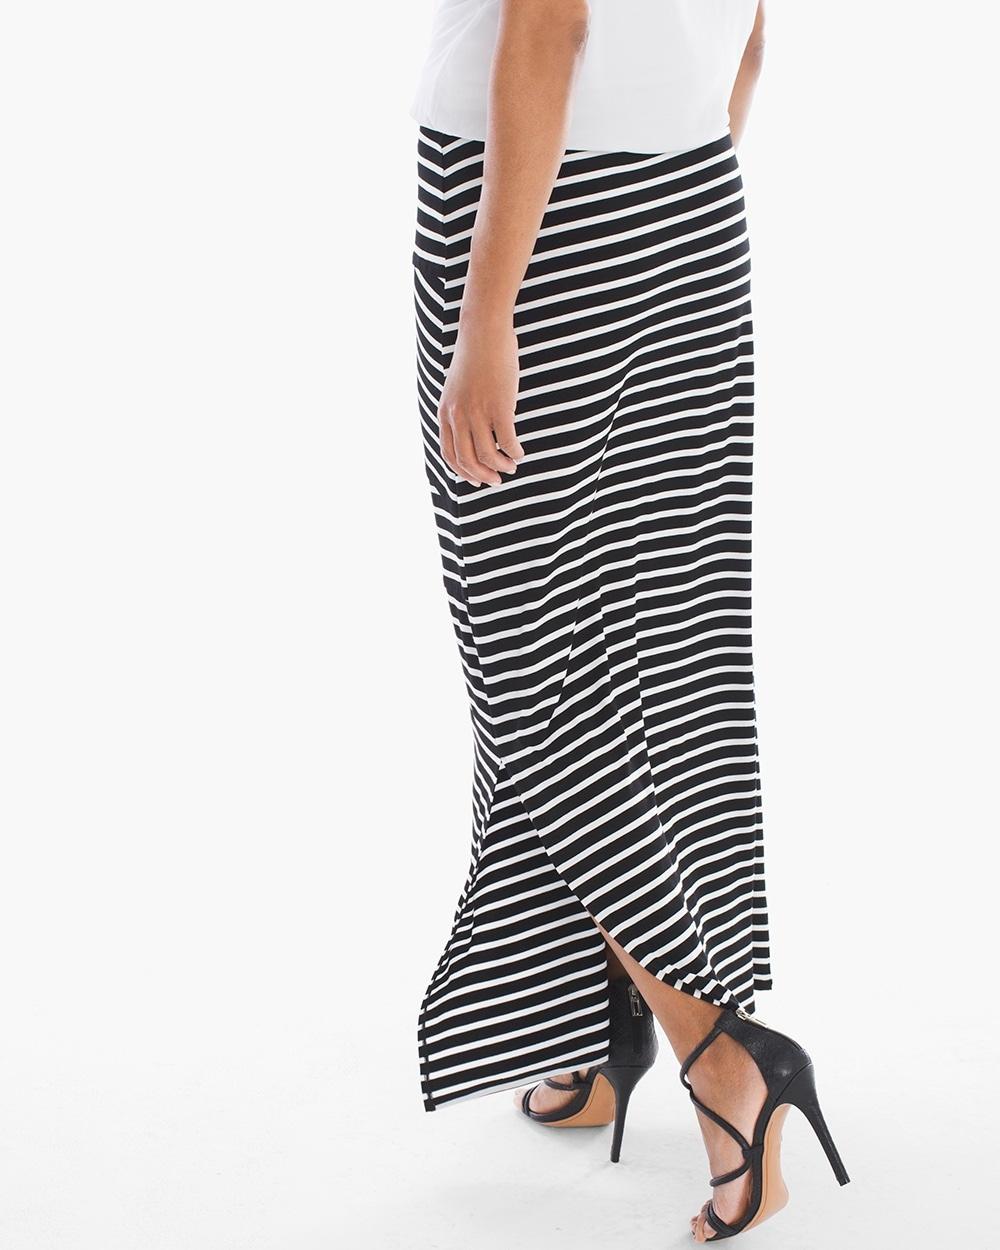 Tinley Black and White Striped Maxi Skirt - Tinley Black And White Striped Maxi Skirt - Chicos